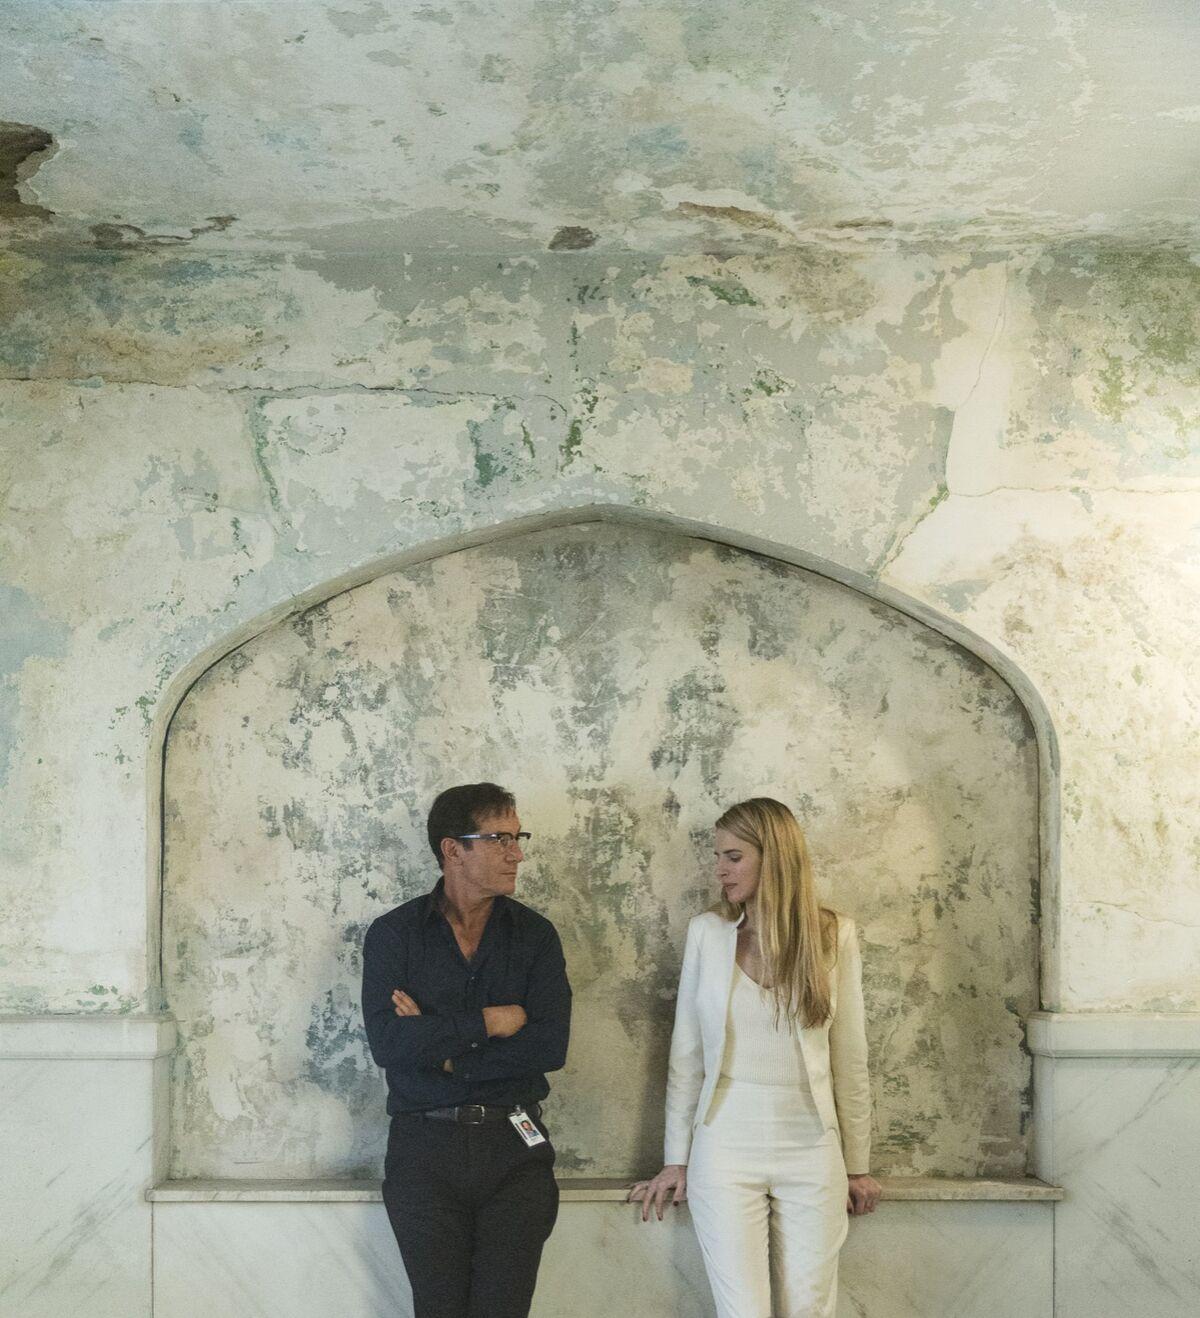 Daniel Rueda and Anna Devís, art for The OA: Part II,  2019. Courtesy of Netflix.